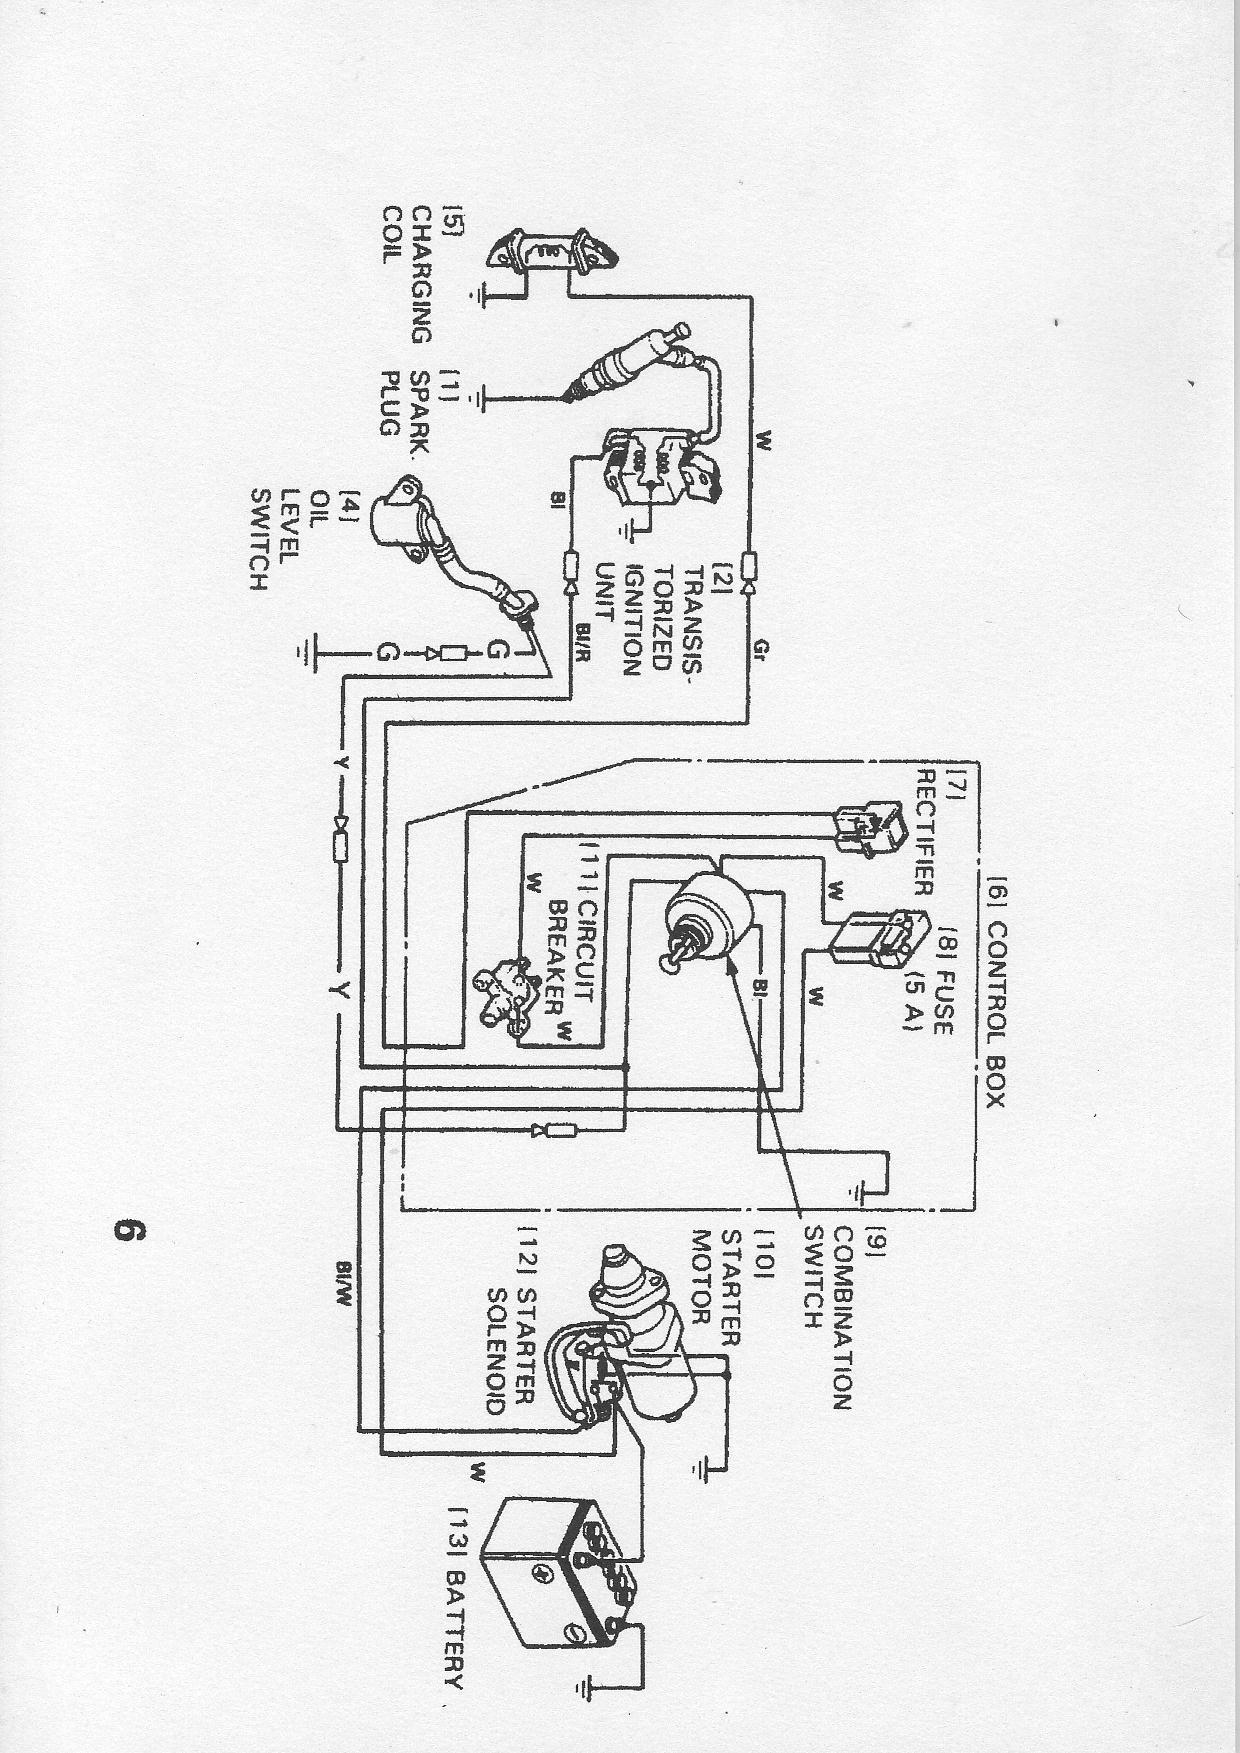 Useful Information - Honda Gx160 Electric Start Wiring Diagram